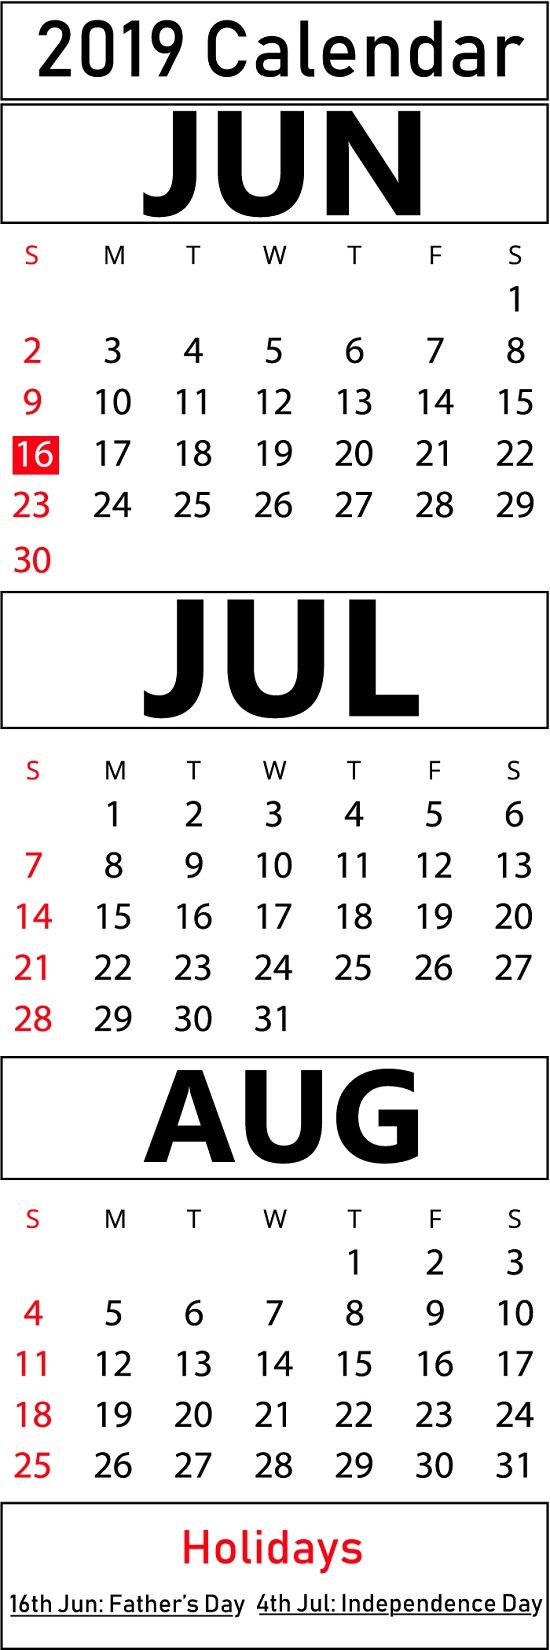 Printable June & July & August 2019 Calendar Templates